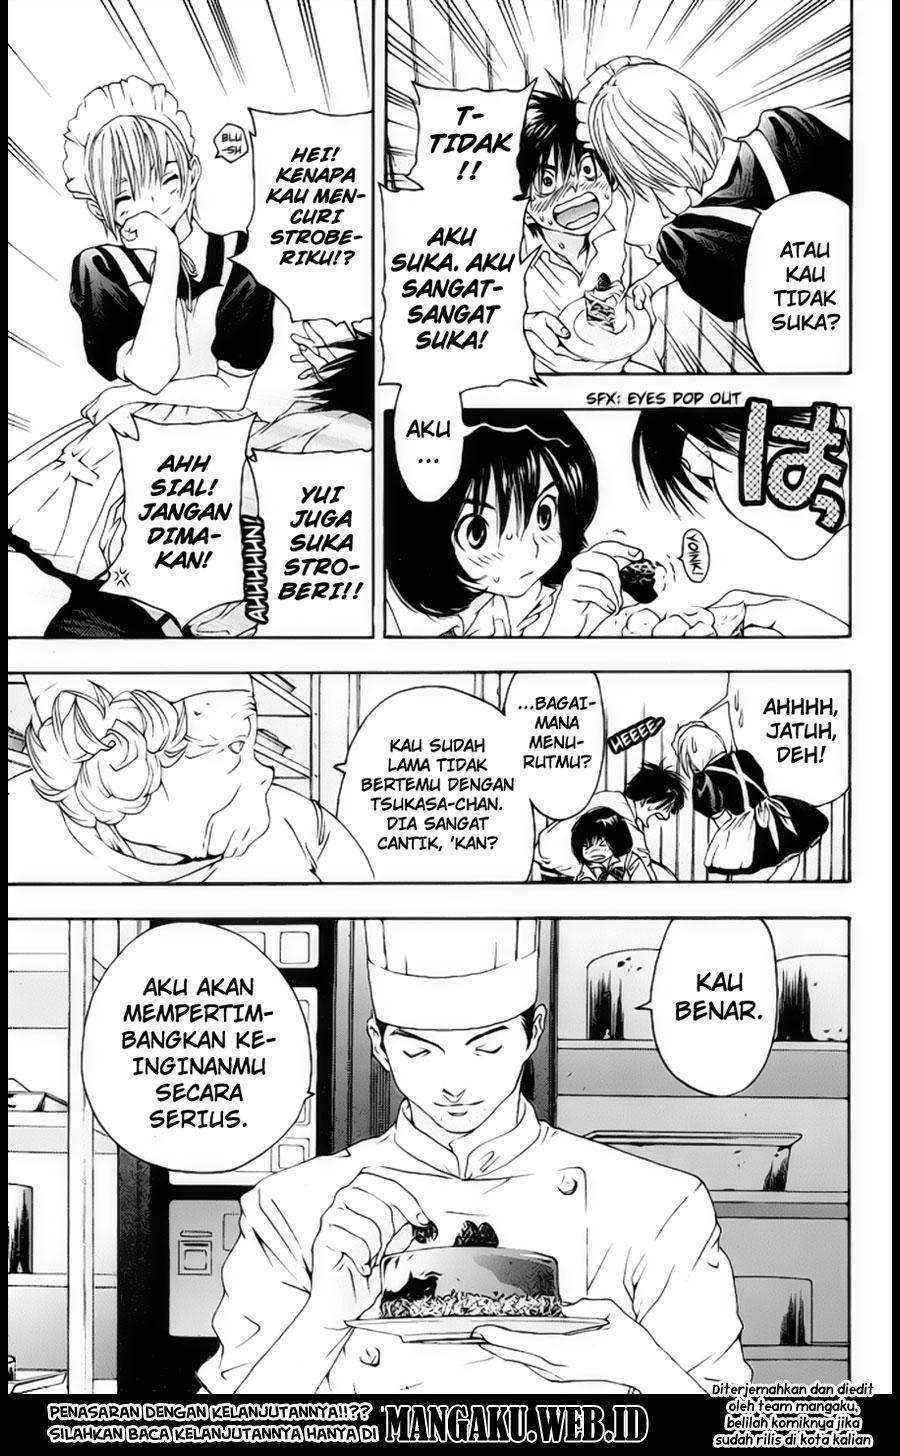 Dilarang COPAS - situs resmi www.mangacanblog.com - Komik ichigo 100 117 - chapter 117 118 Indonesia ichigo 100 117 - chapter 117 Terbaru 20|Baca Manga Komik Indonesia|Mangacan